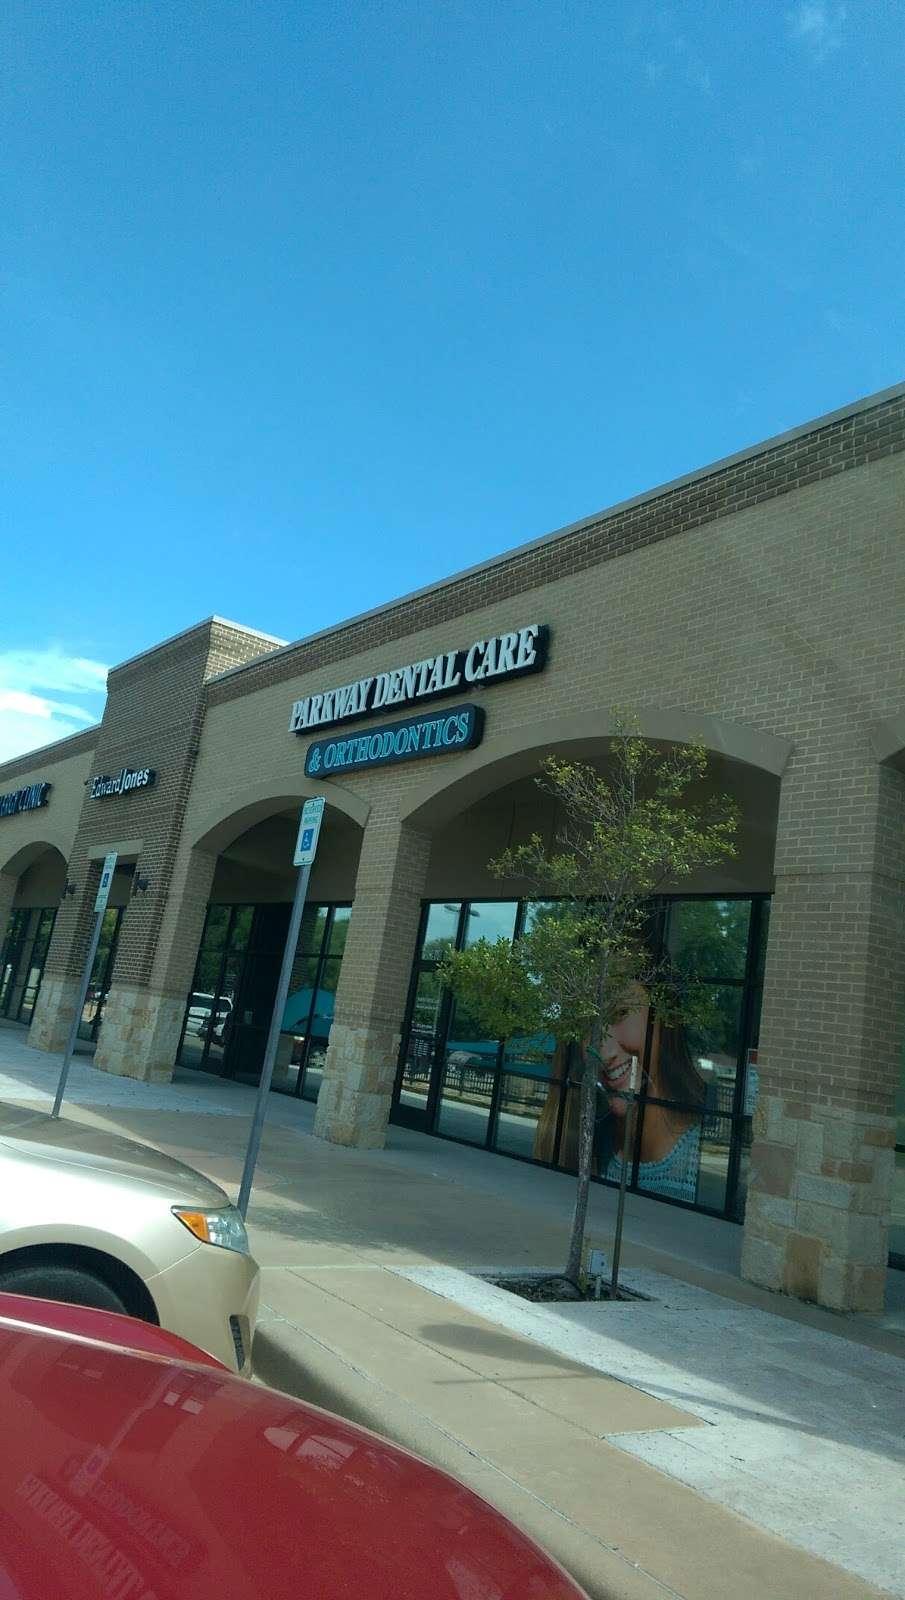 Oak Park Village - shopping mall  | Photo 3 of 6 | Address: 2380 Firewheel Pkwy, Garland, TX 75040, USA | Phone: (972) 898-8884